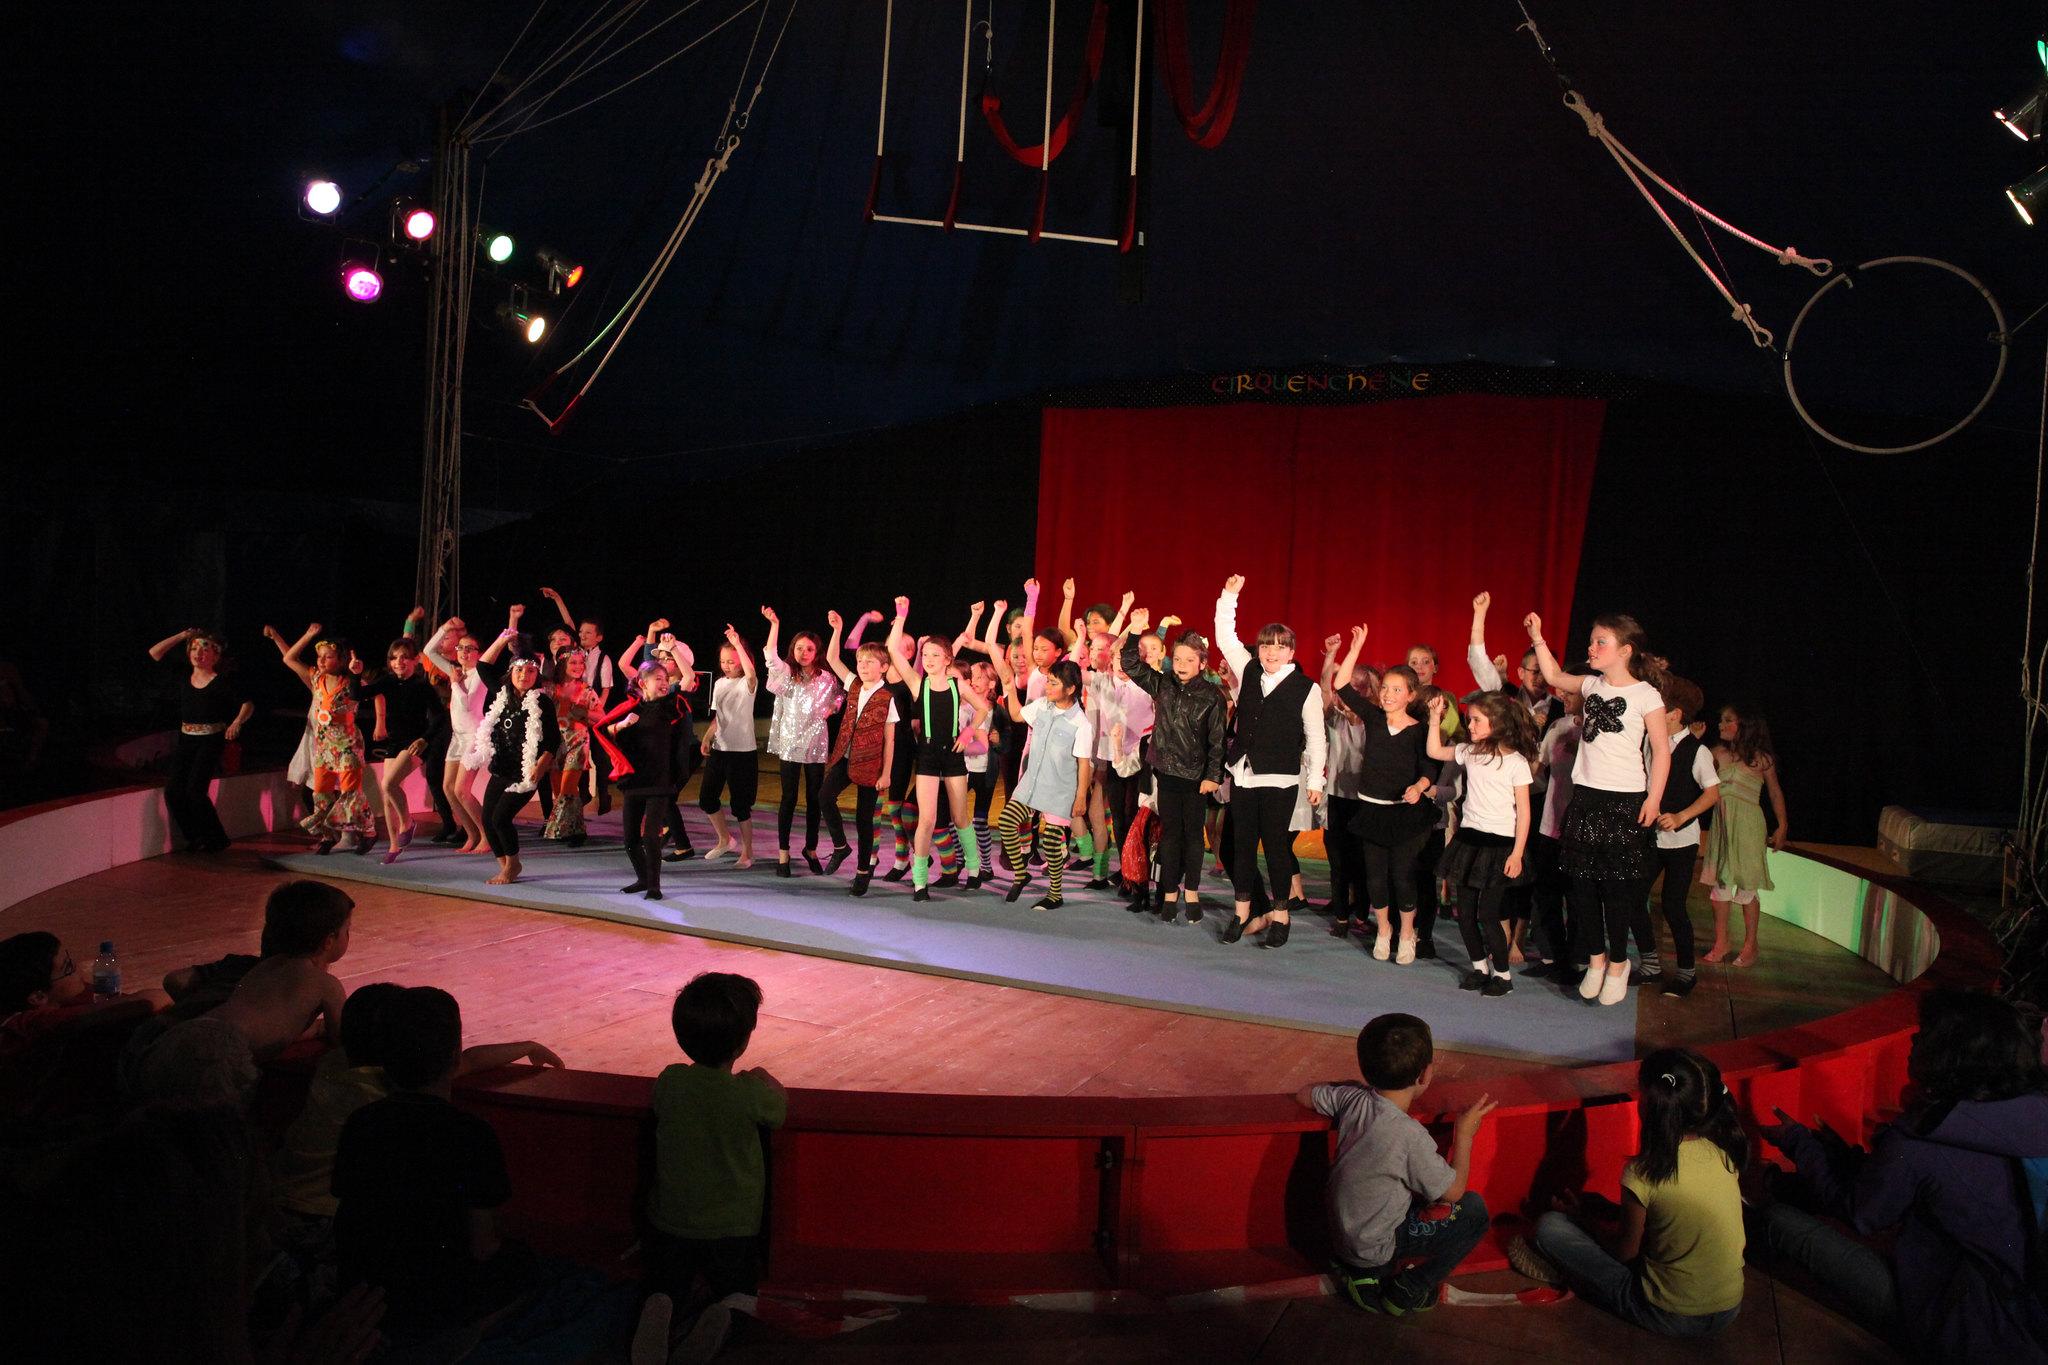 école de cirque cirquenchêne à Chêne bougeries